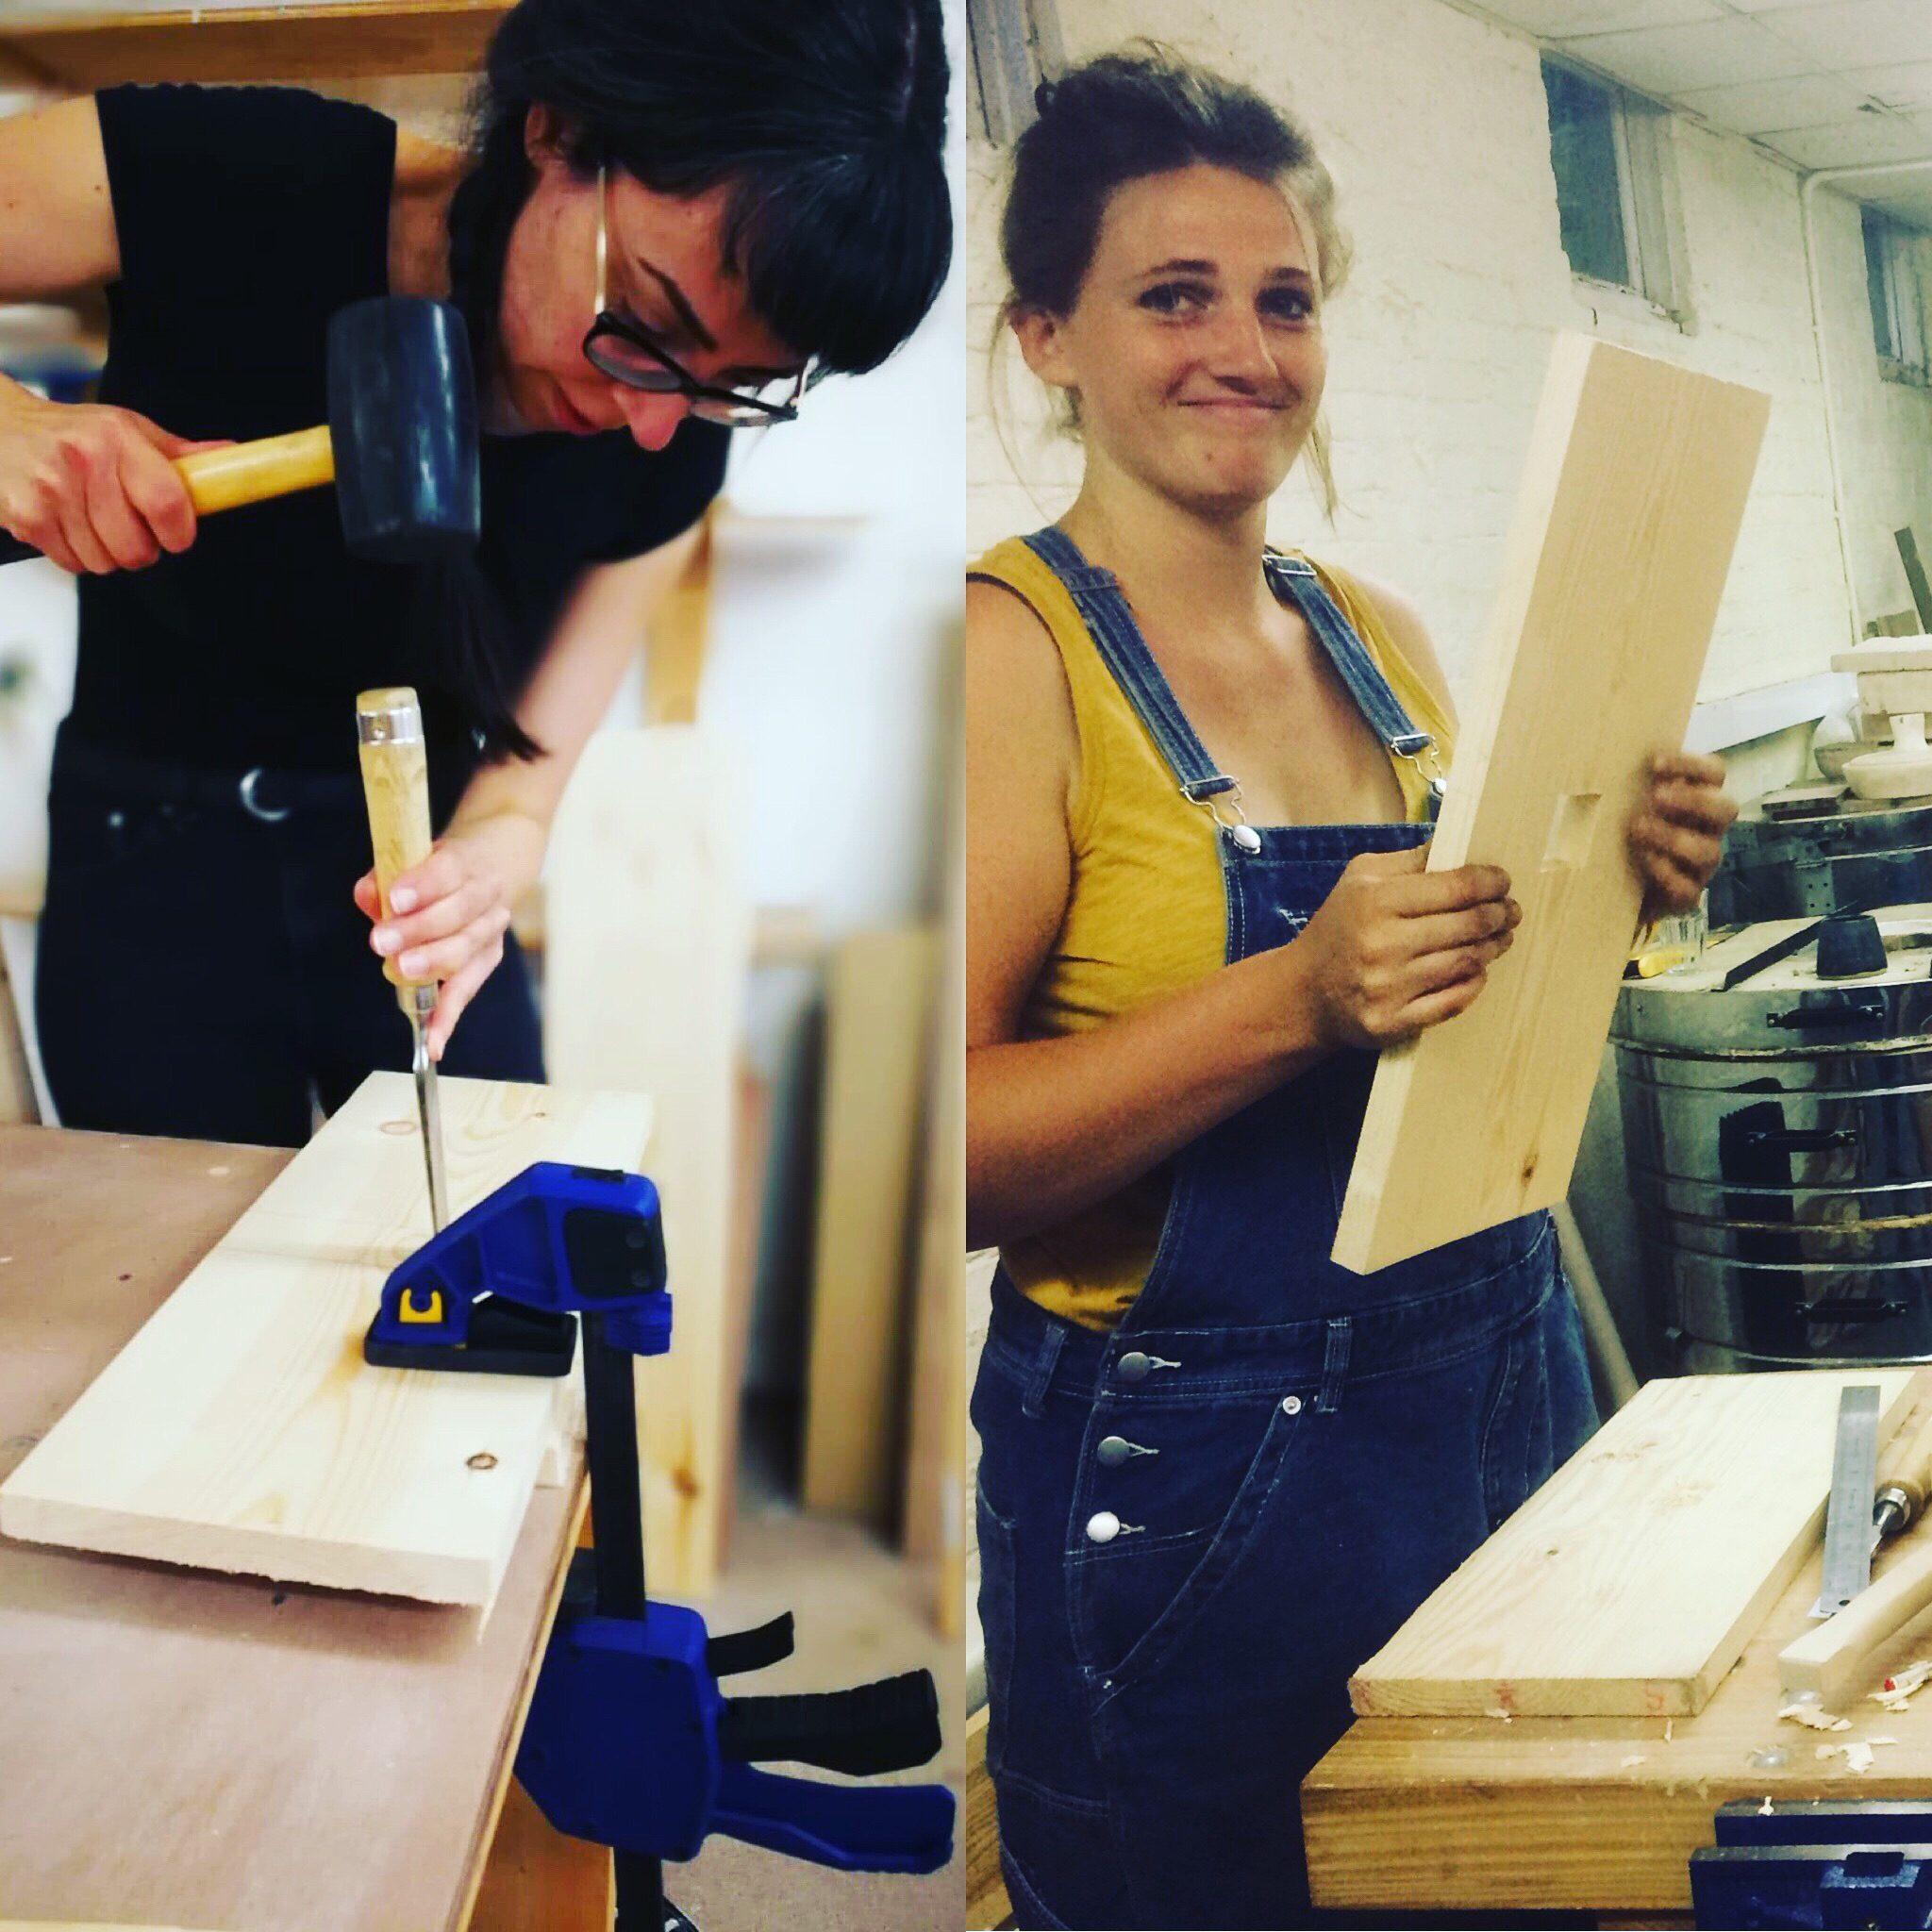 Carpentry for Women Dartington 6 week Course